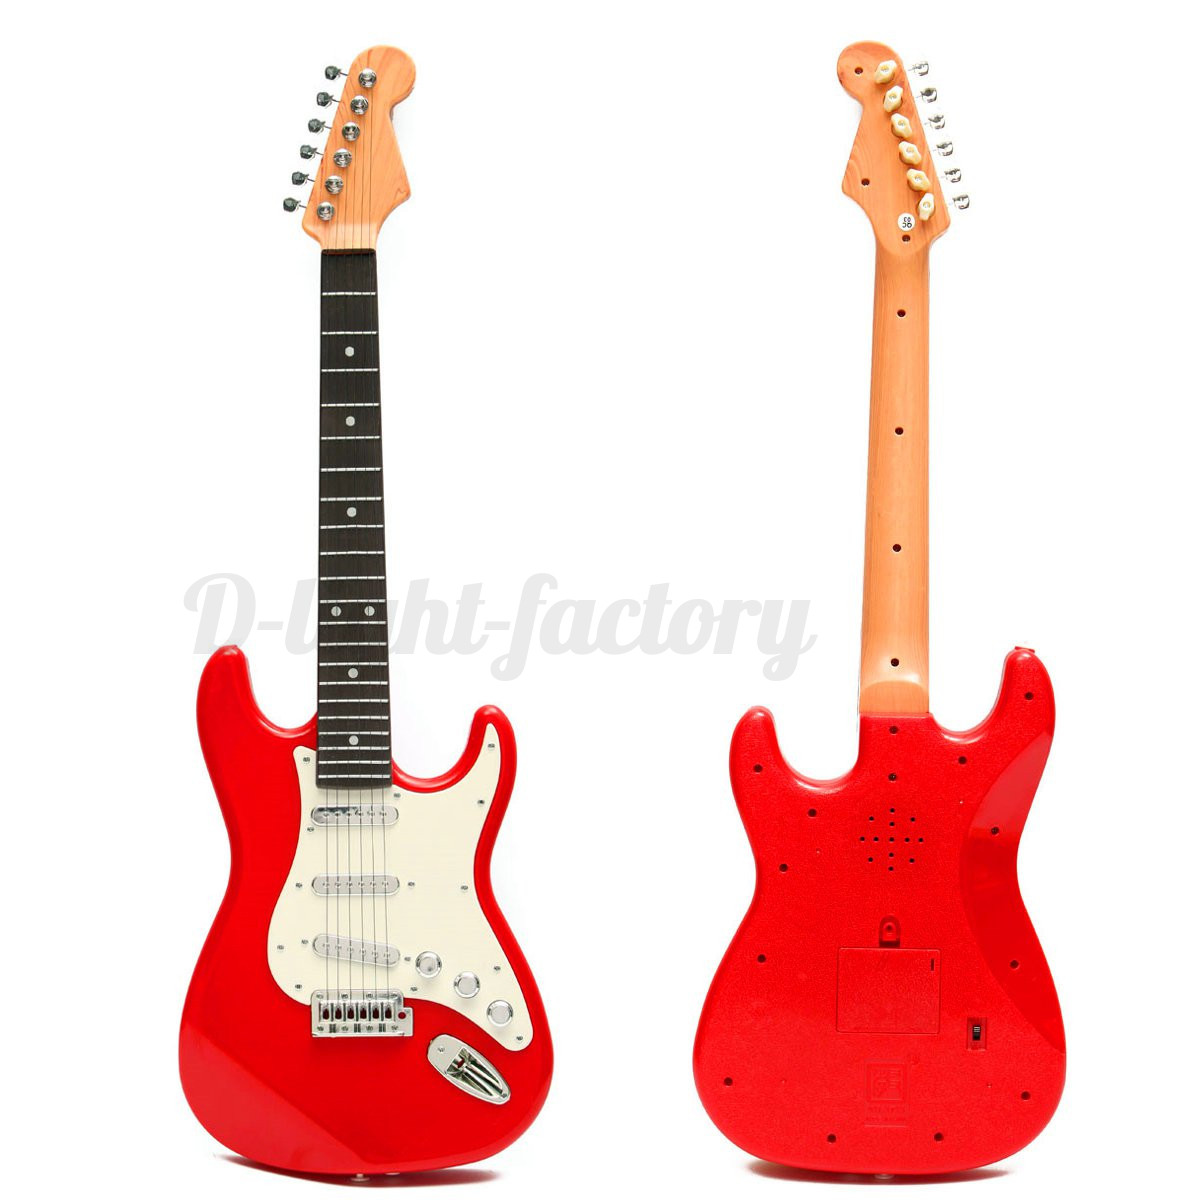 Ocean Toy Gitar Terompet Set Mainan Musik Anak Oct291 Multicolor Y Kle 800x800